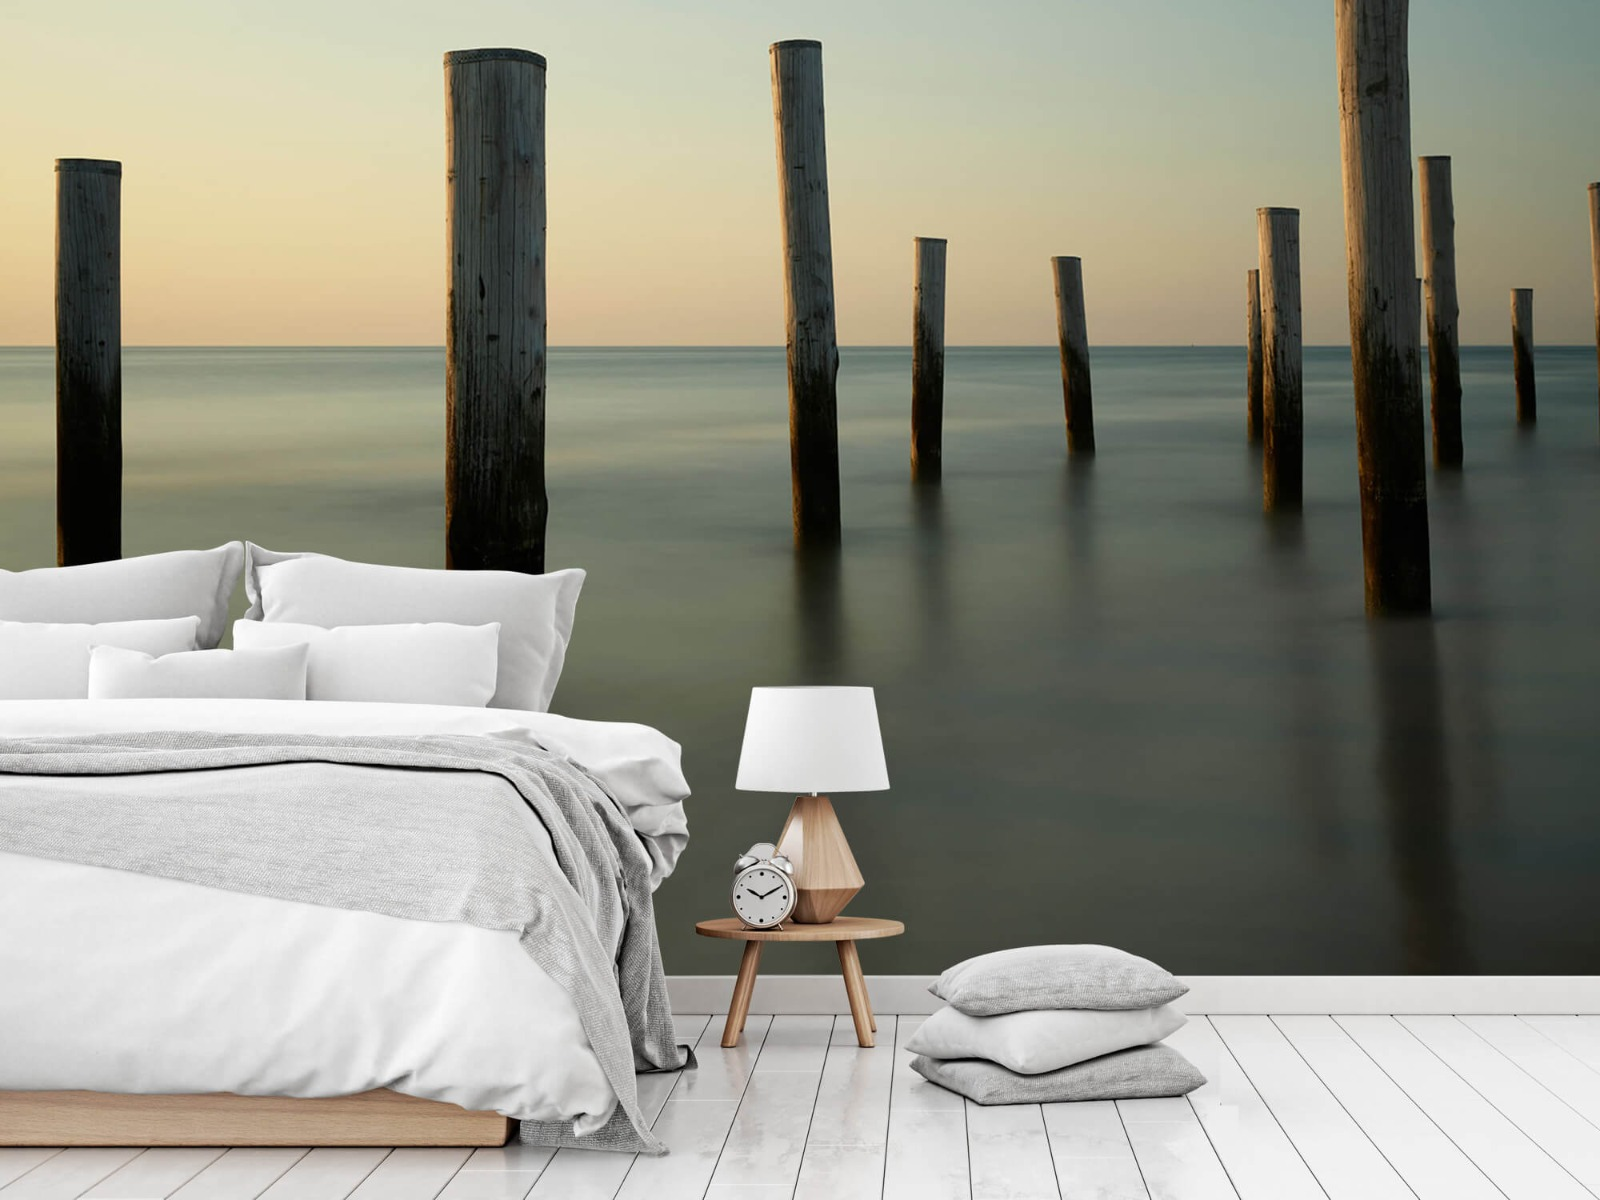 Zeeën en Oceanen - Houten strandpalen - Slaapkamer 16